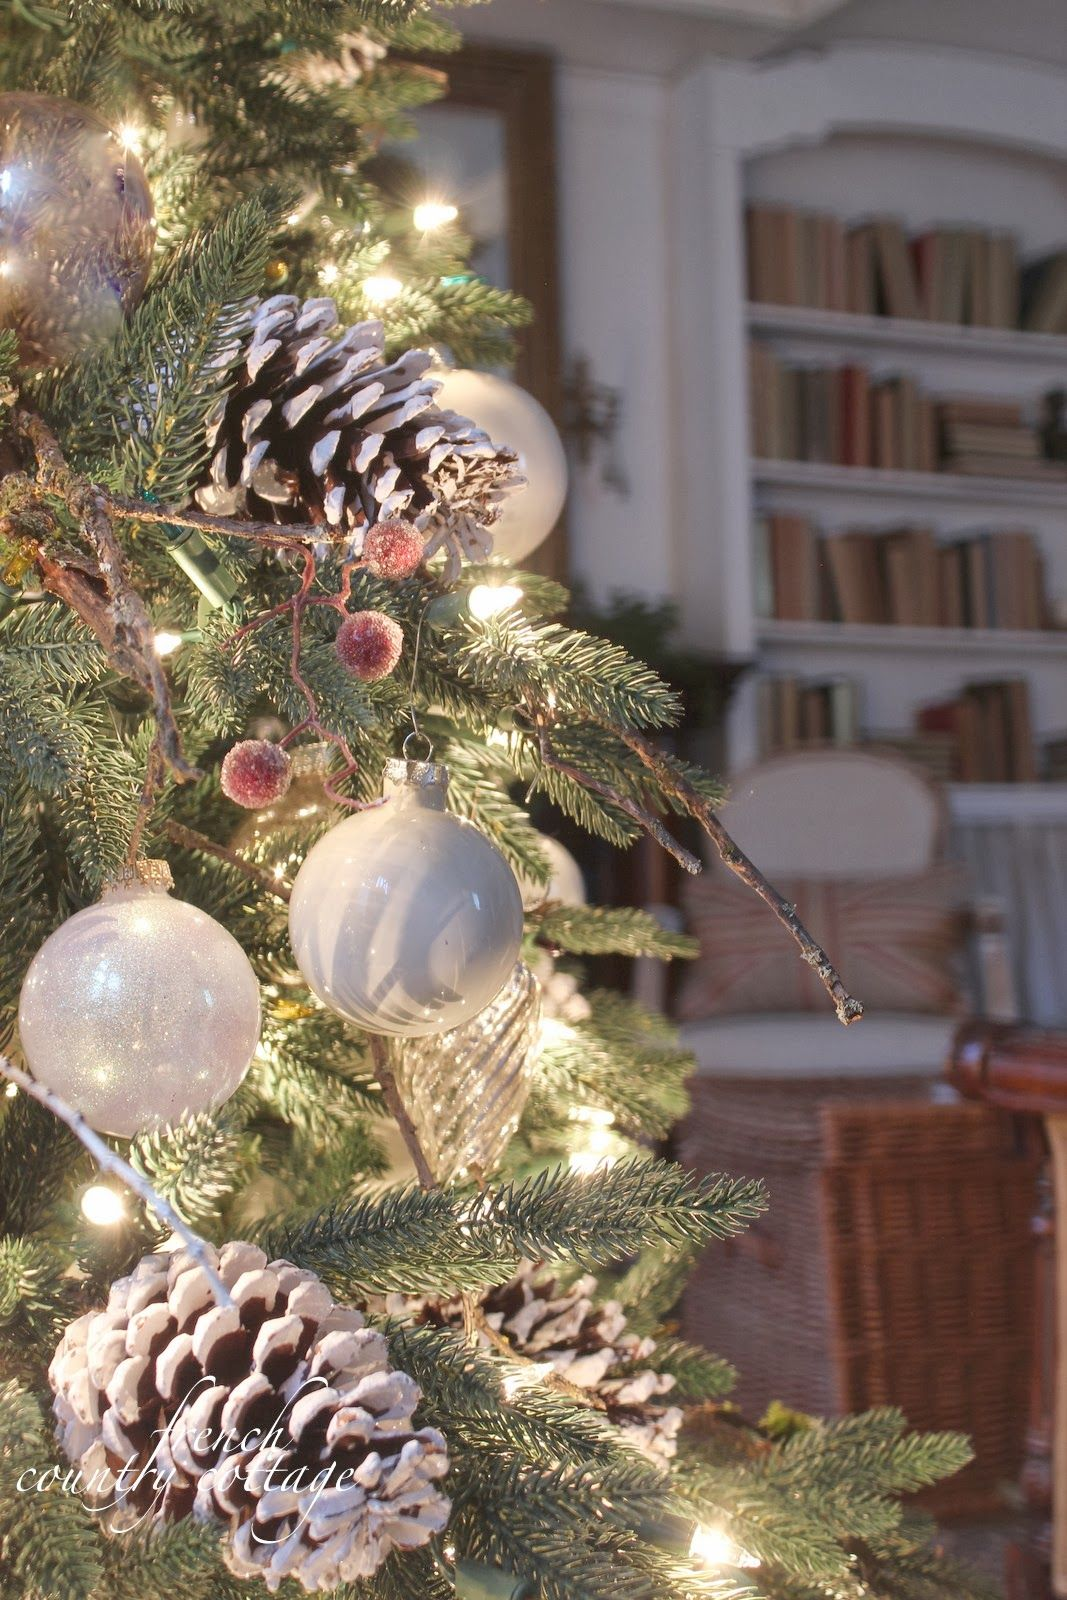 img 7120 jpg 1 067 1 600 pixels christmas pinterest cottage